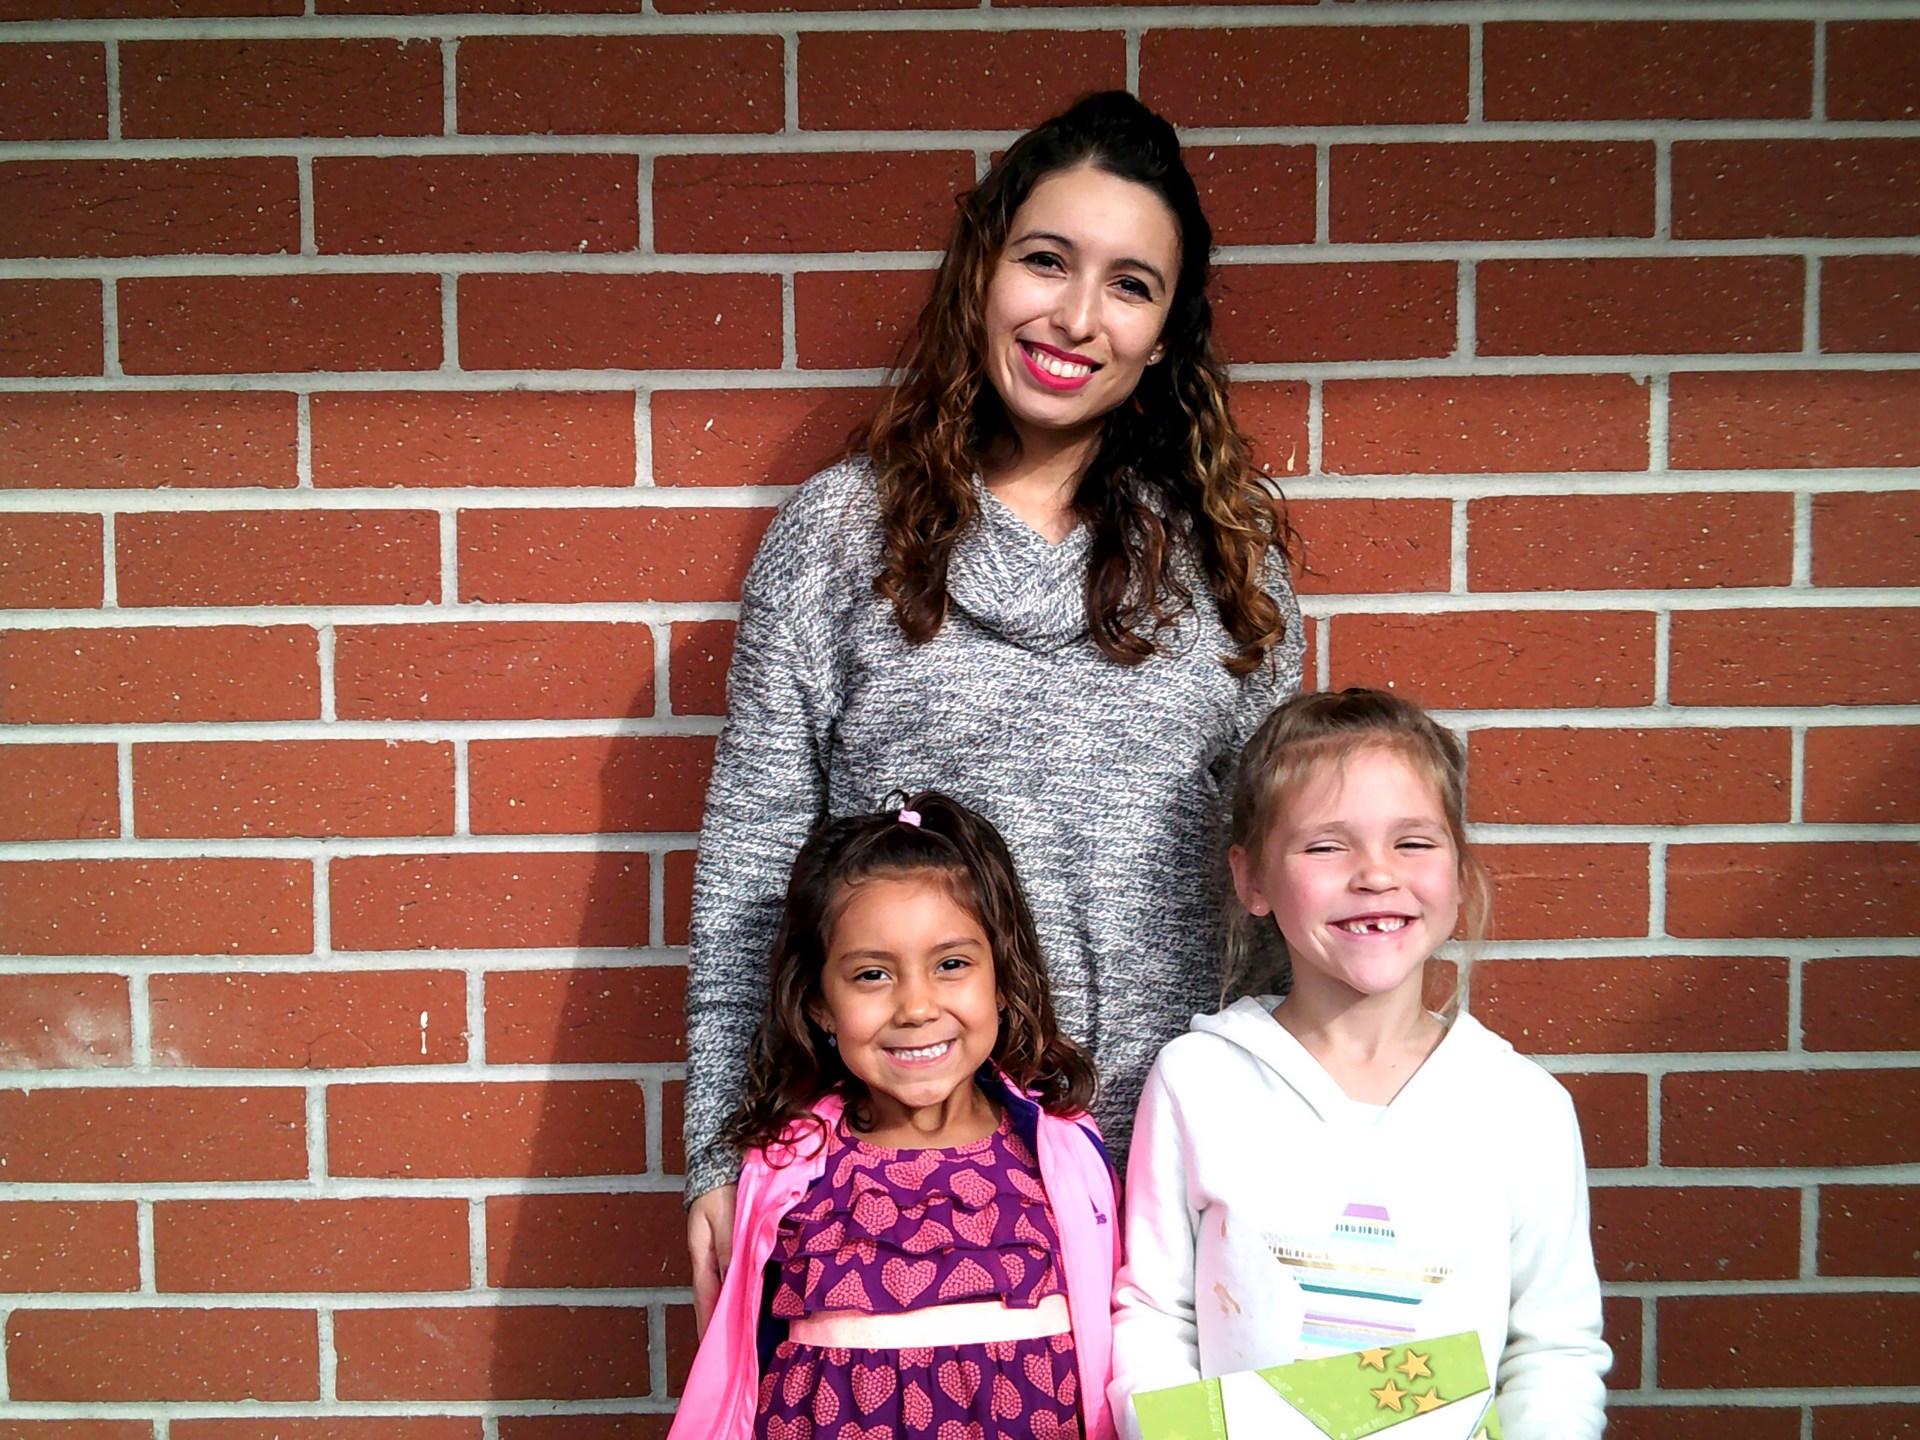 Ms. Galvan's November Honorees